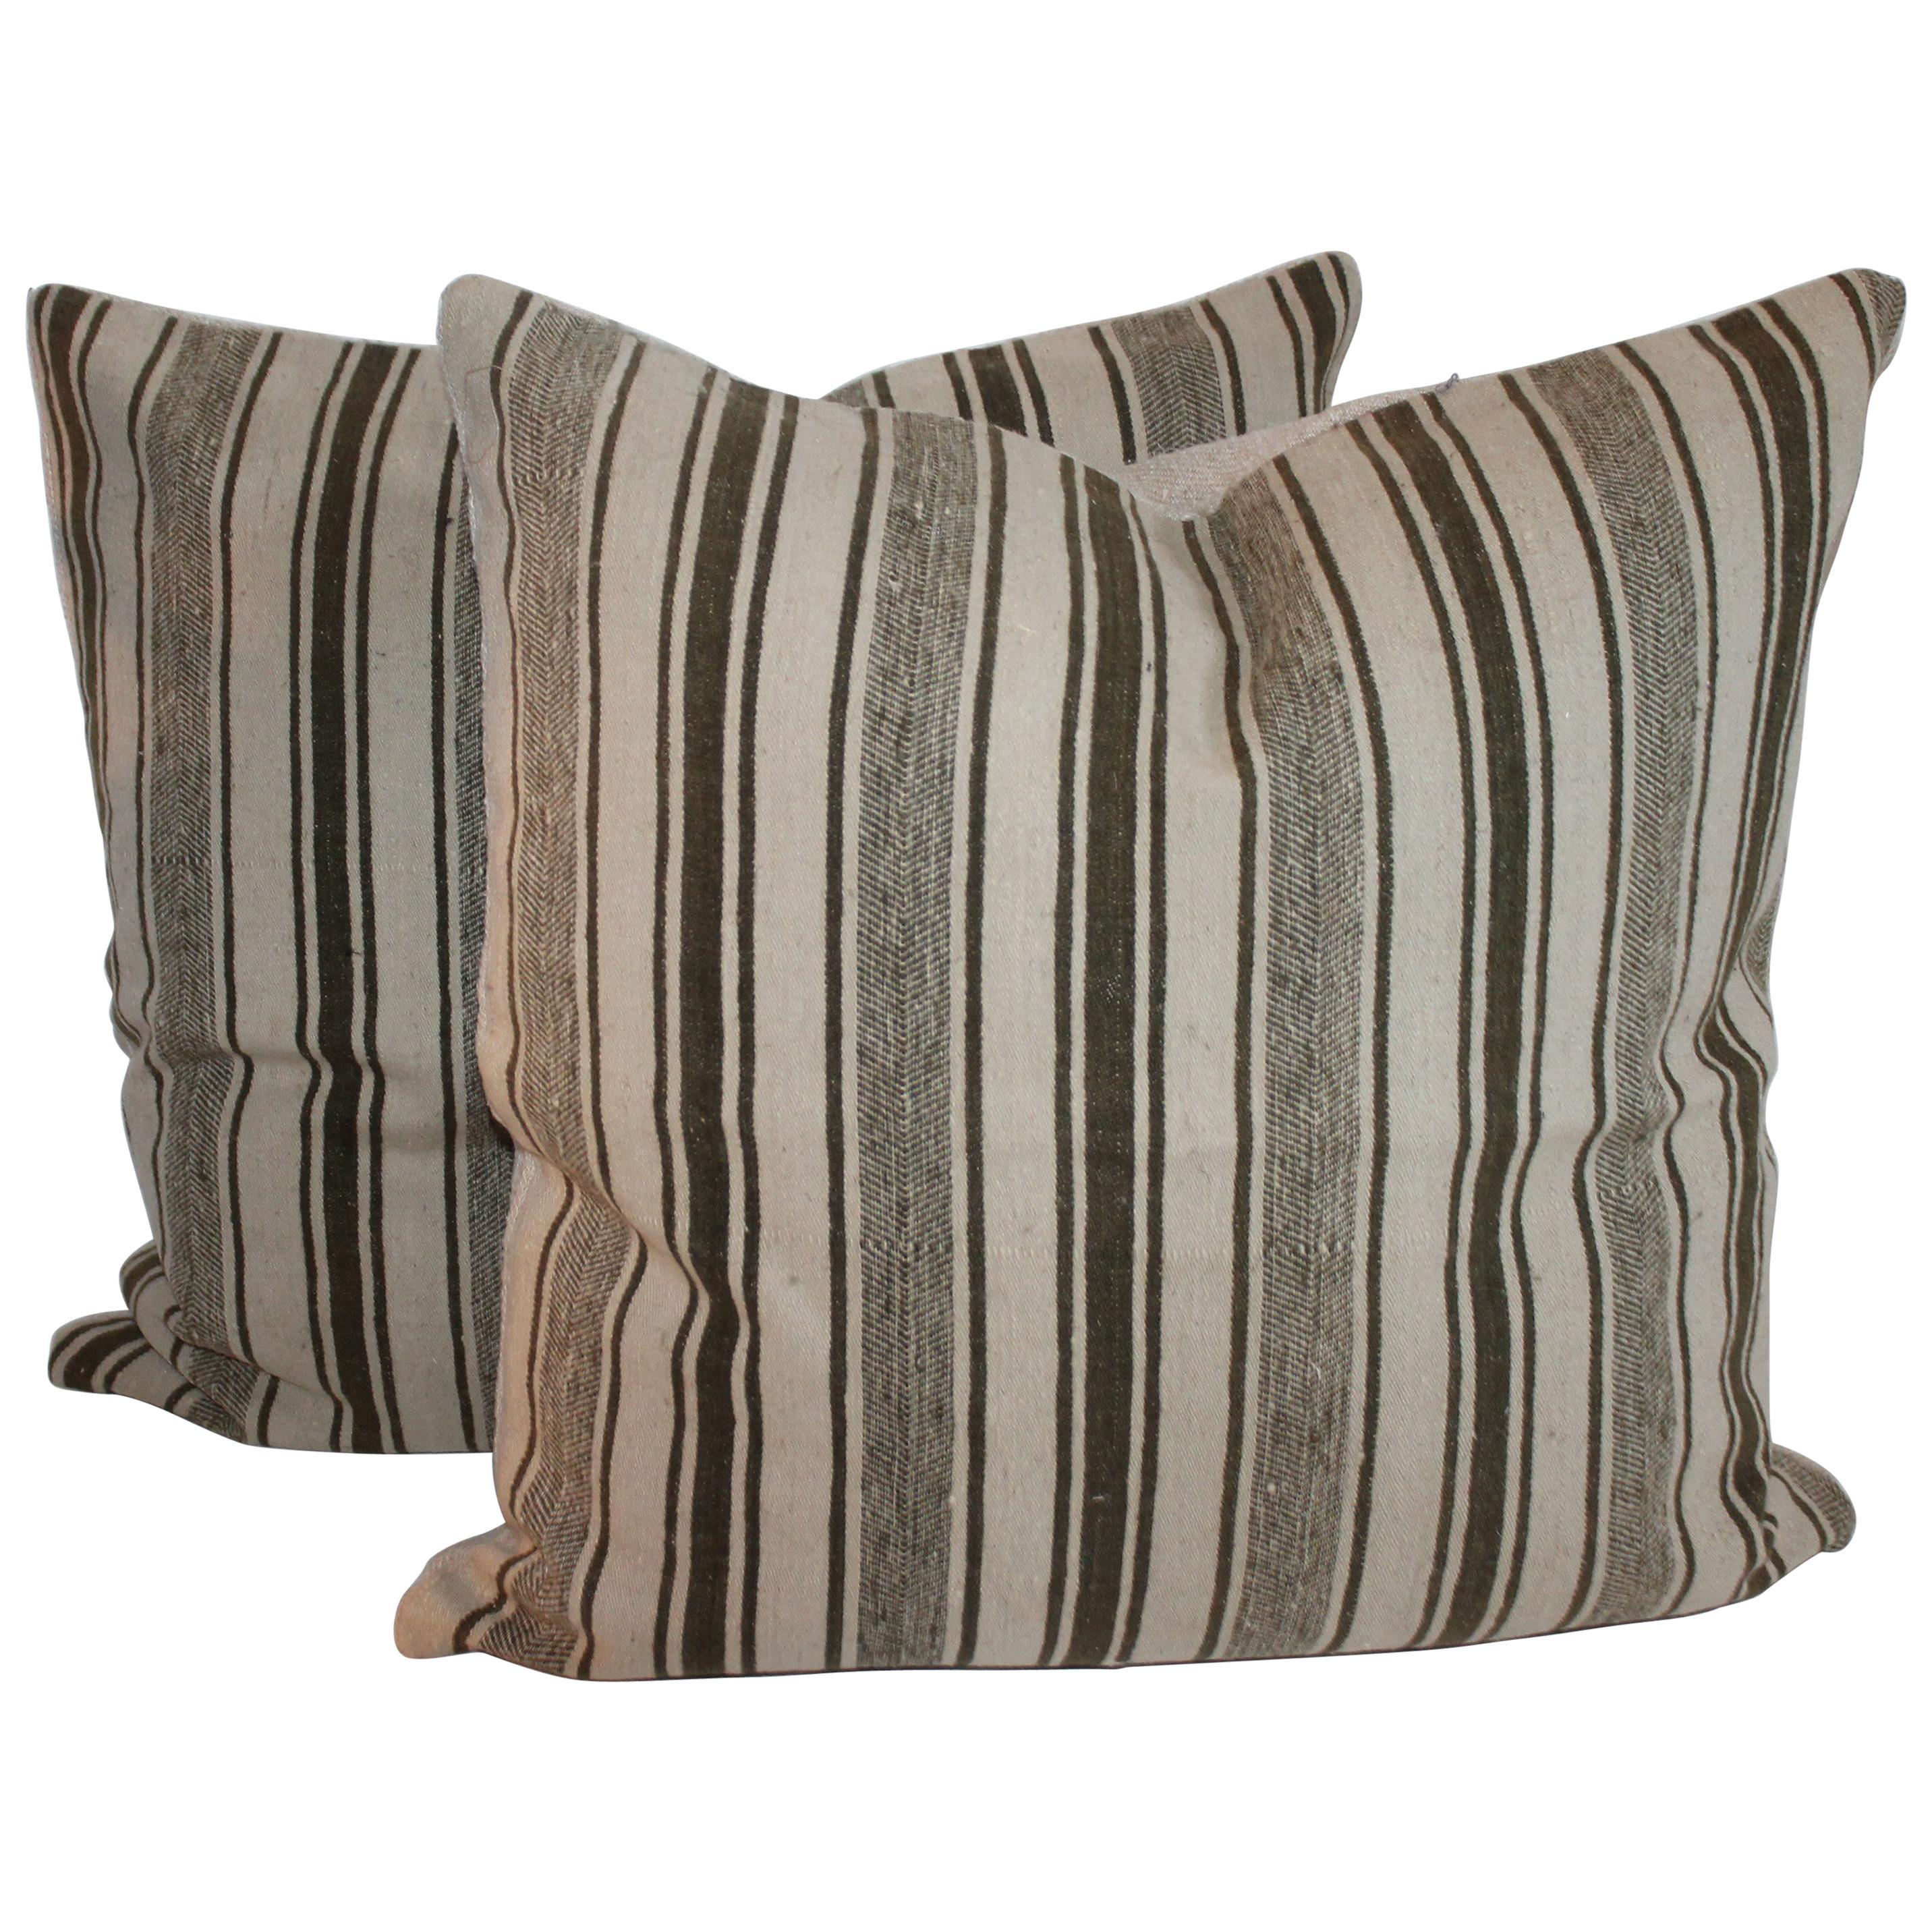 19Thc Striped Wool Ticking Pillows, Pair